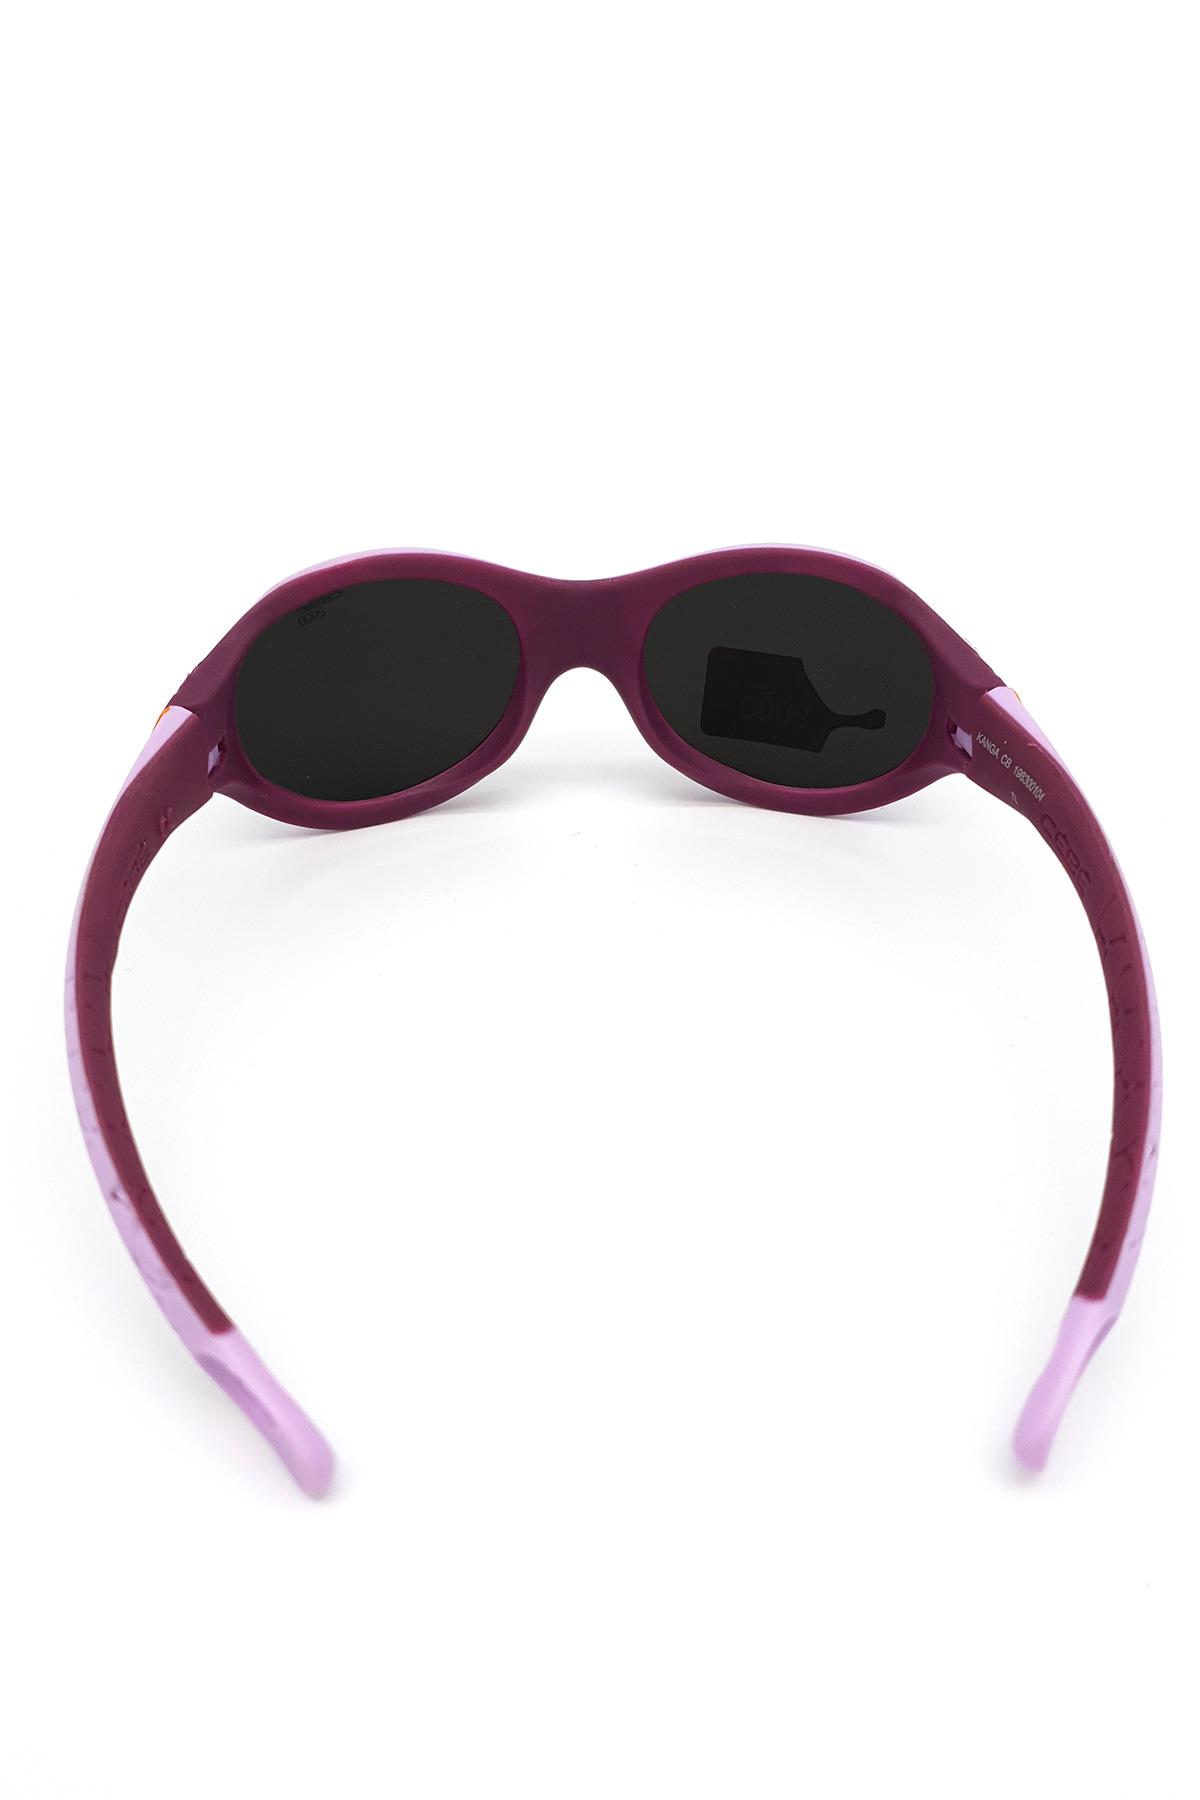 Cebe Kanga Çocuk Gözlük Pembe 2000 Grey Cb198300104